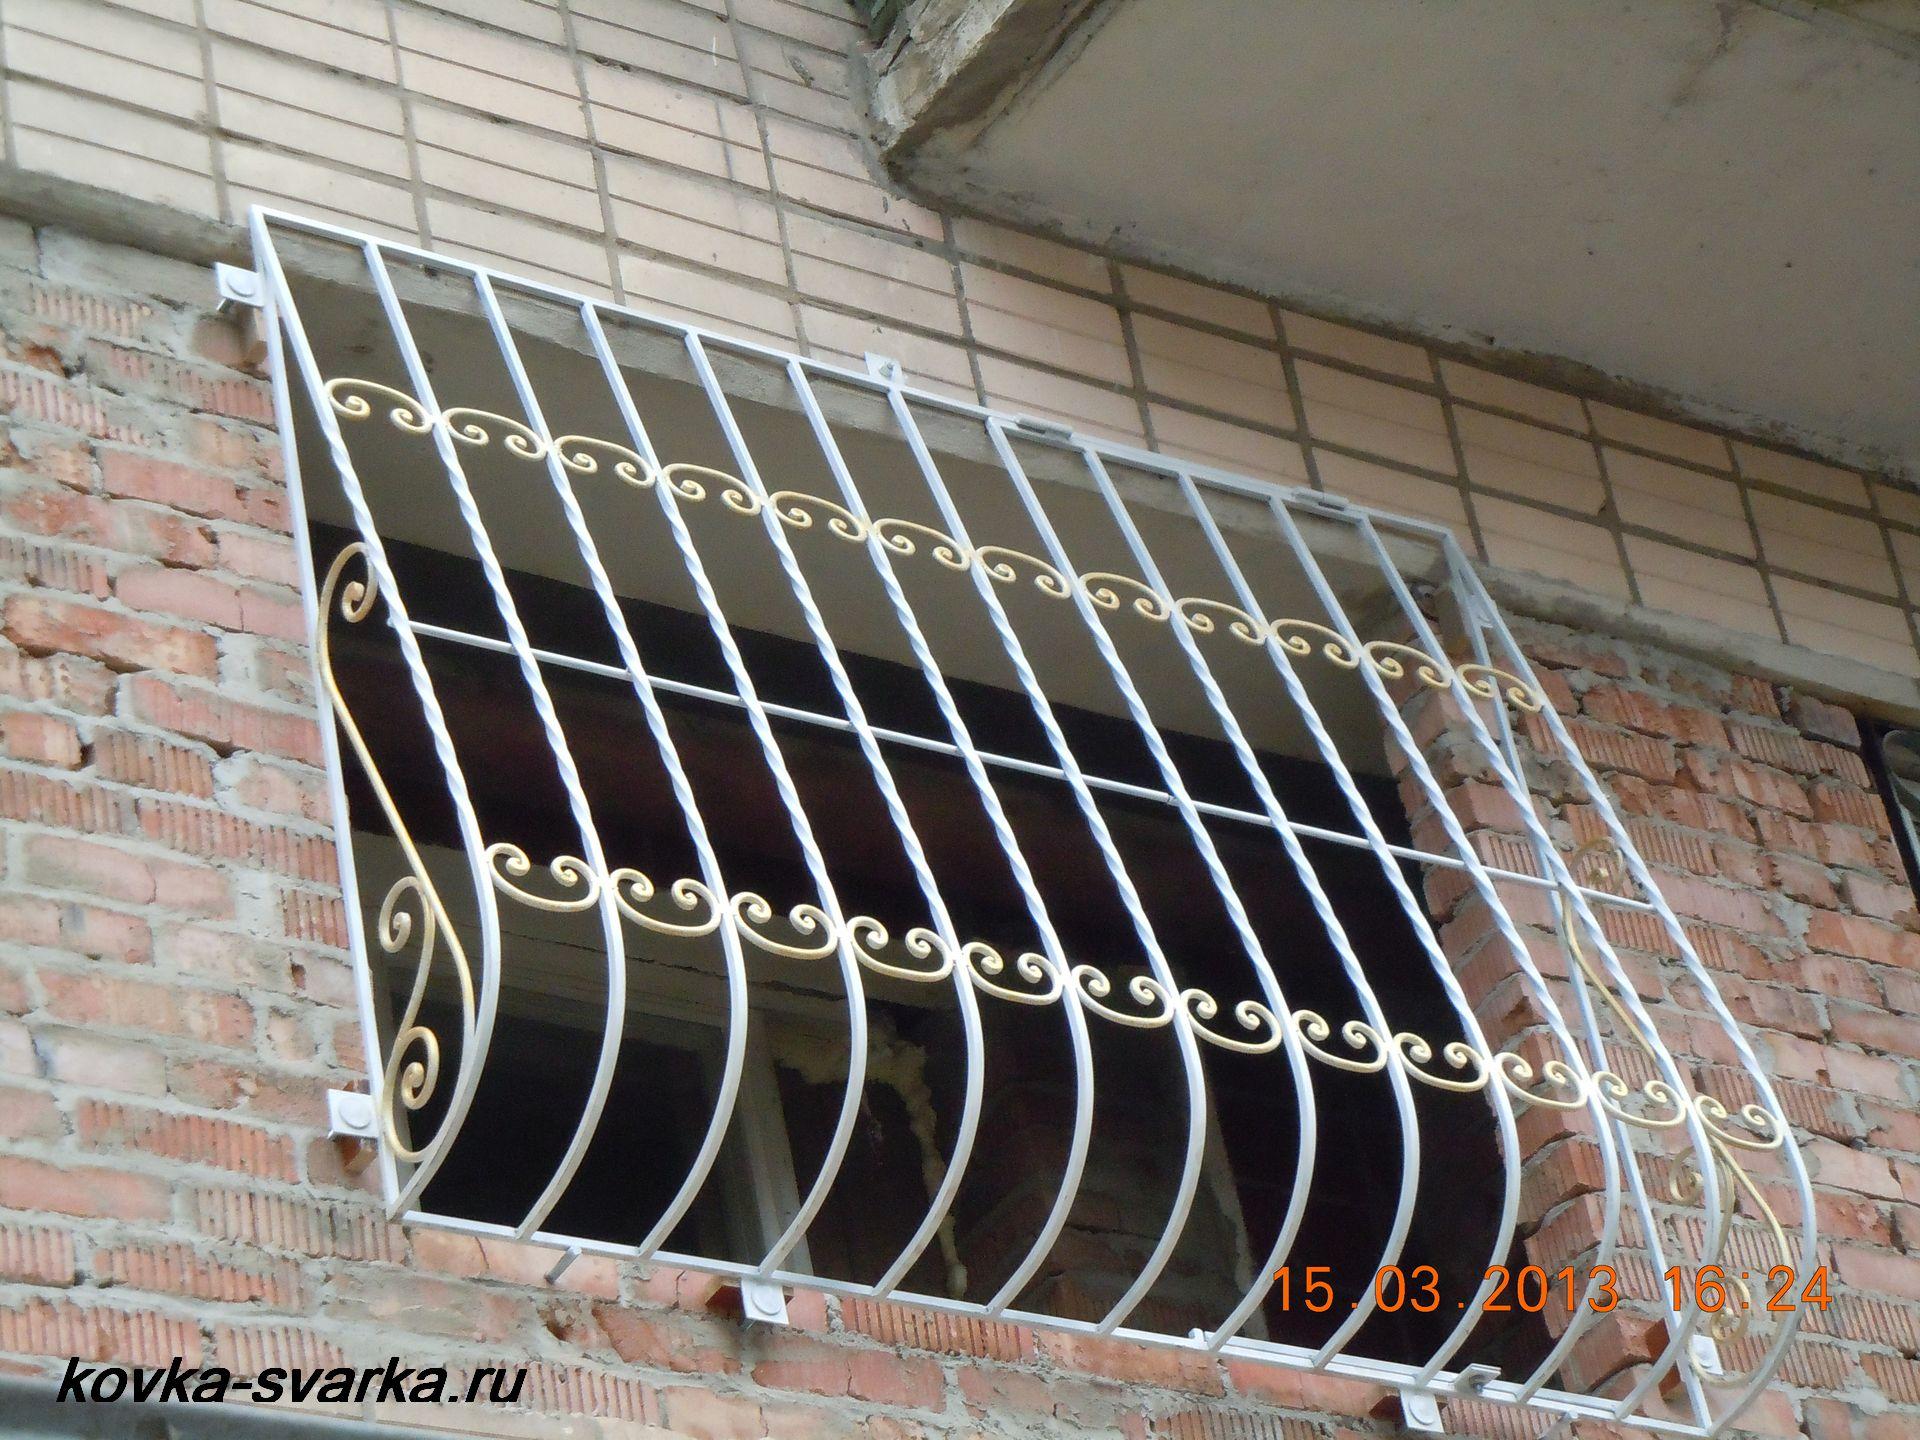 Фото кованых решеток